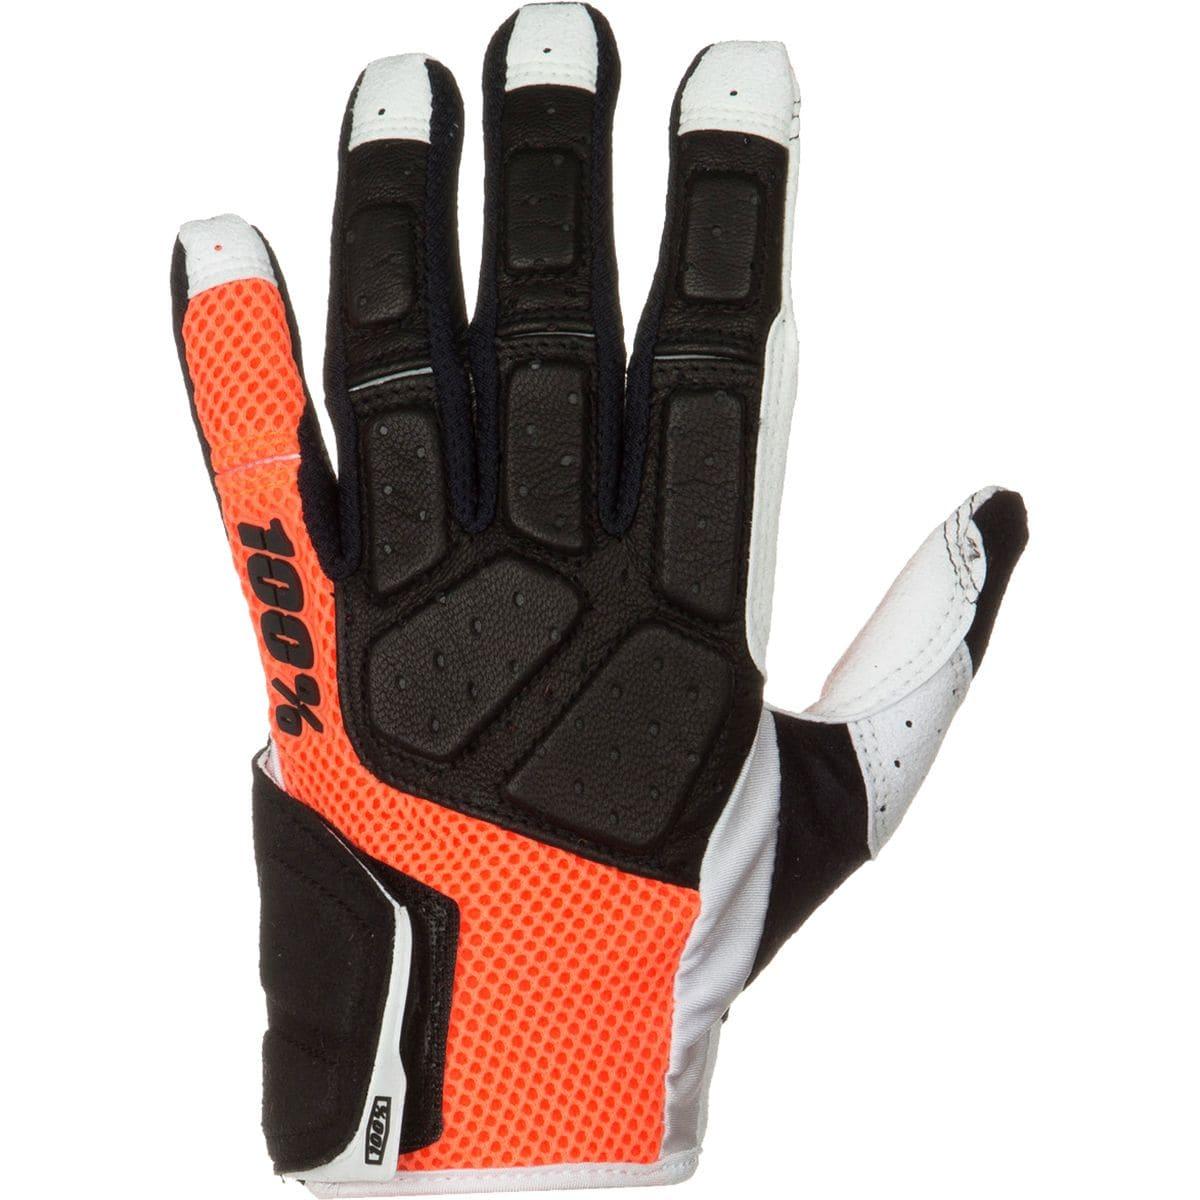 100-Simi-Glove-Men-039-s miniature 12